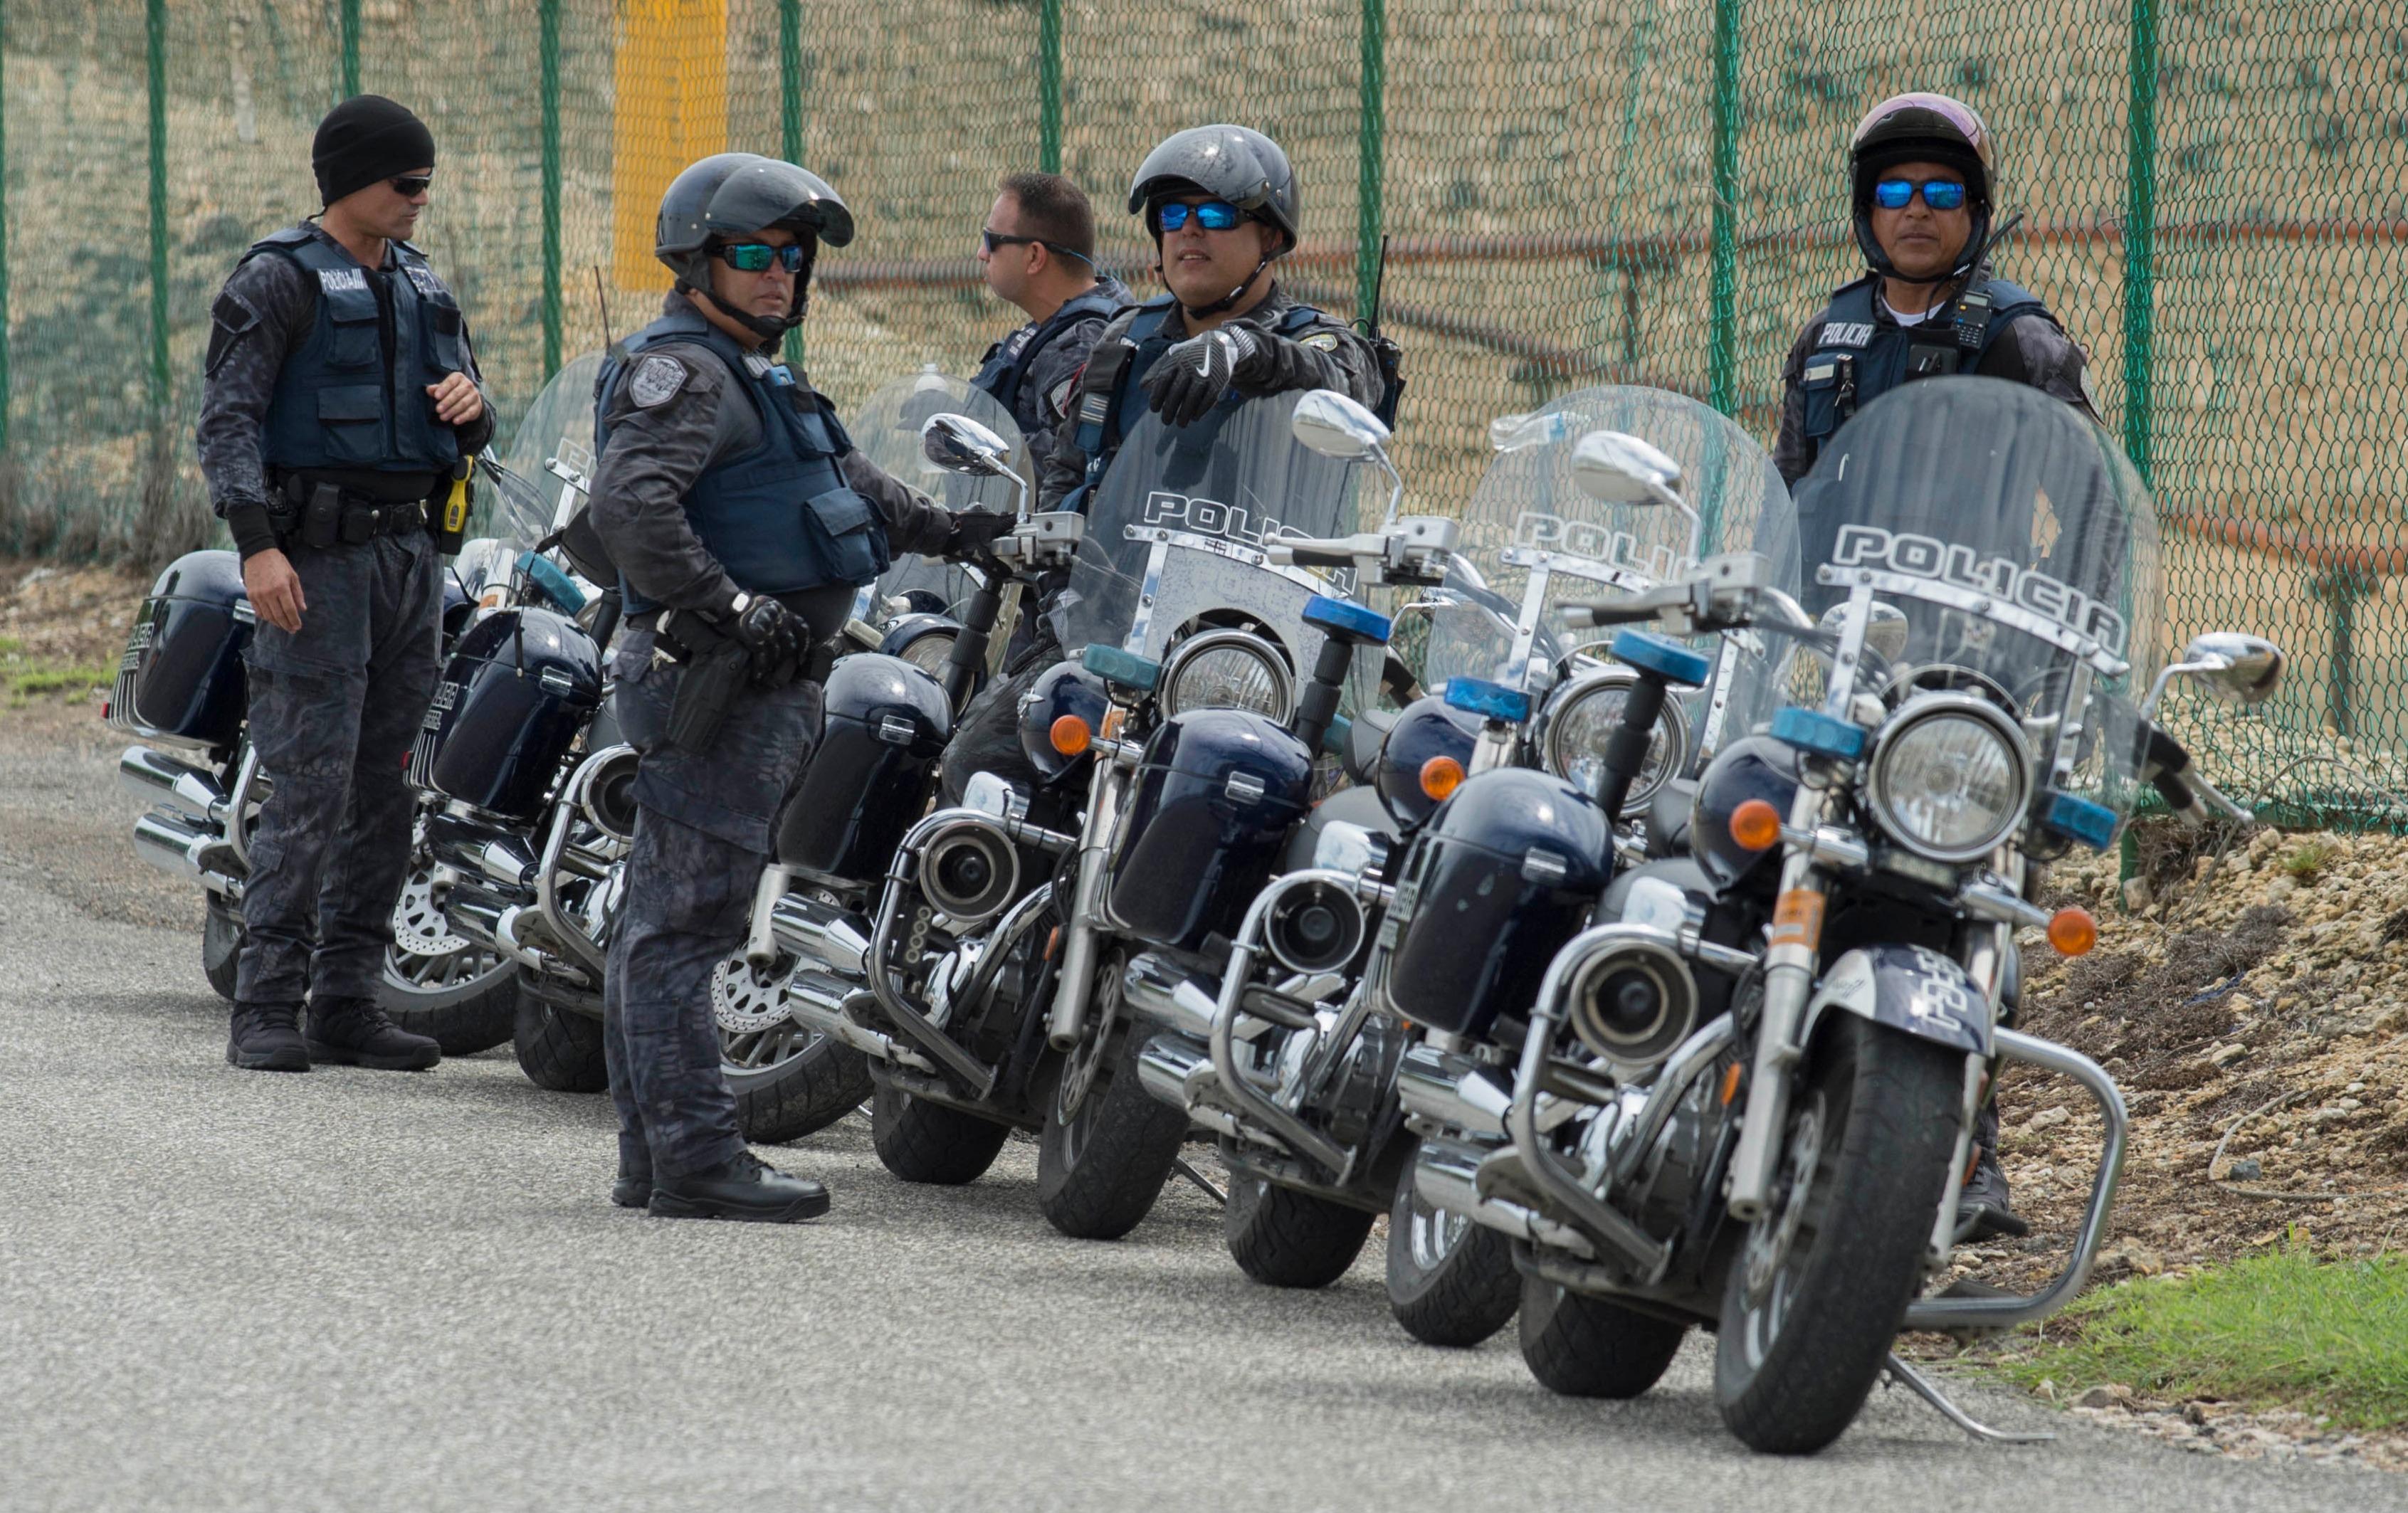 policias, motoras